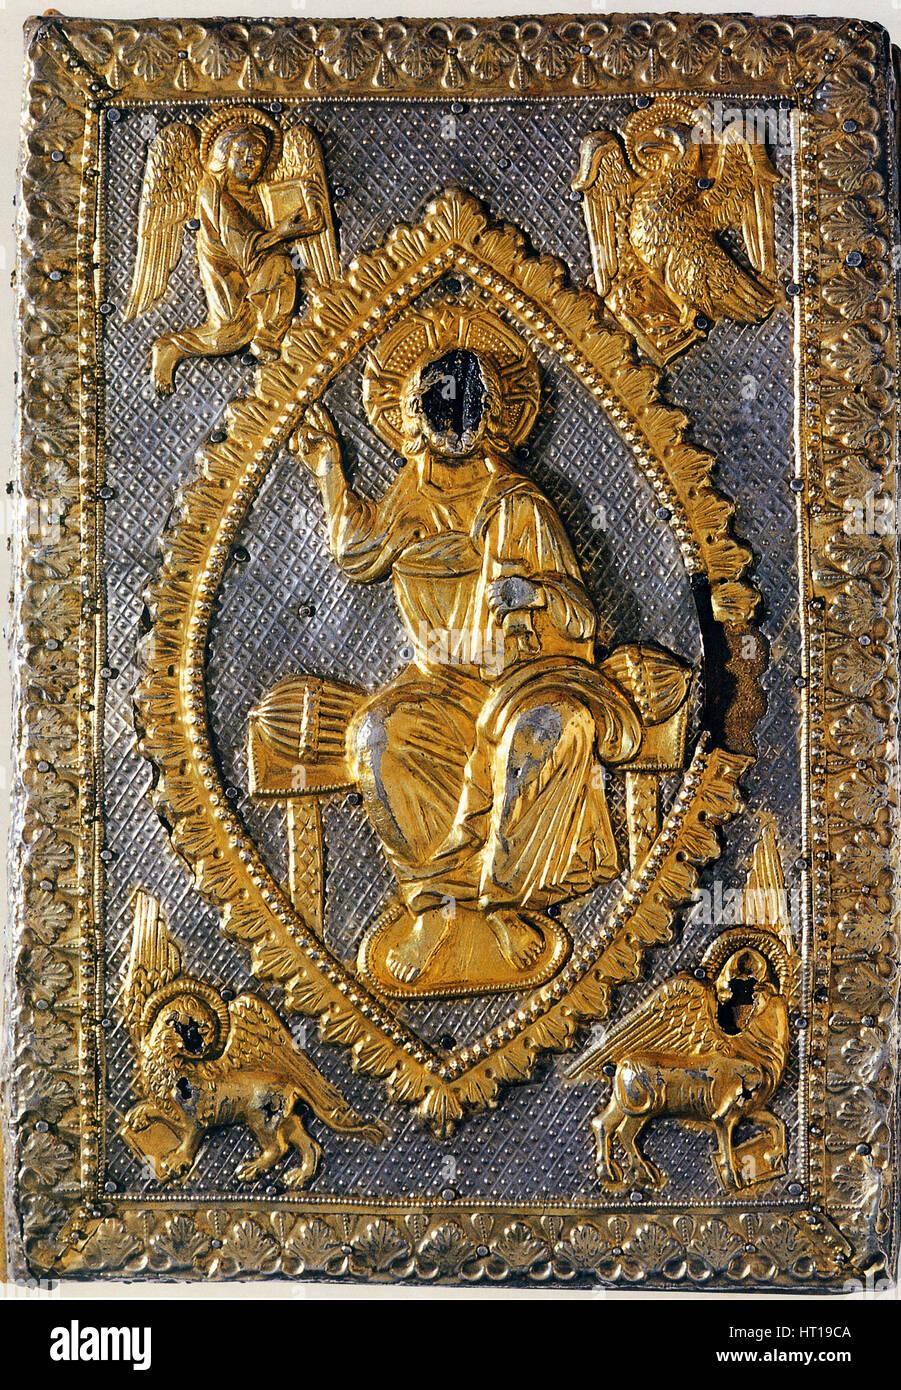 The Gospels Book of Matilda of Canossa, 11th century. Artist: West European Applied Art - Stock Image